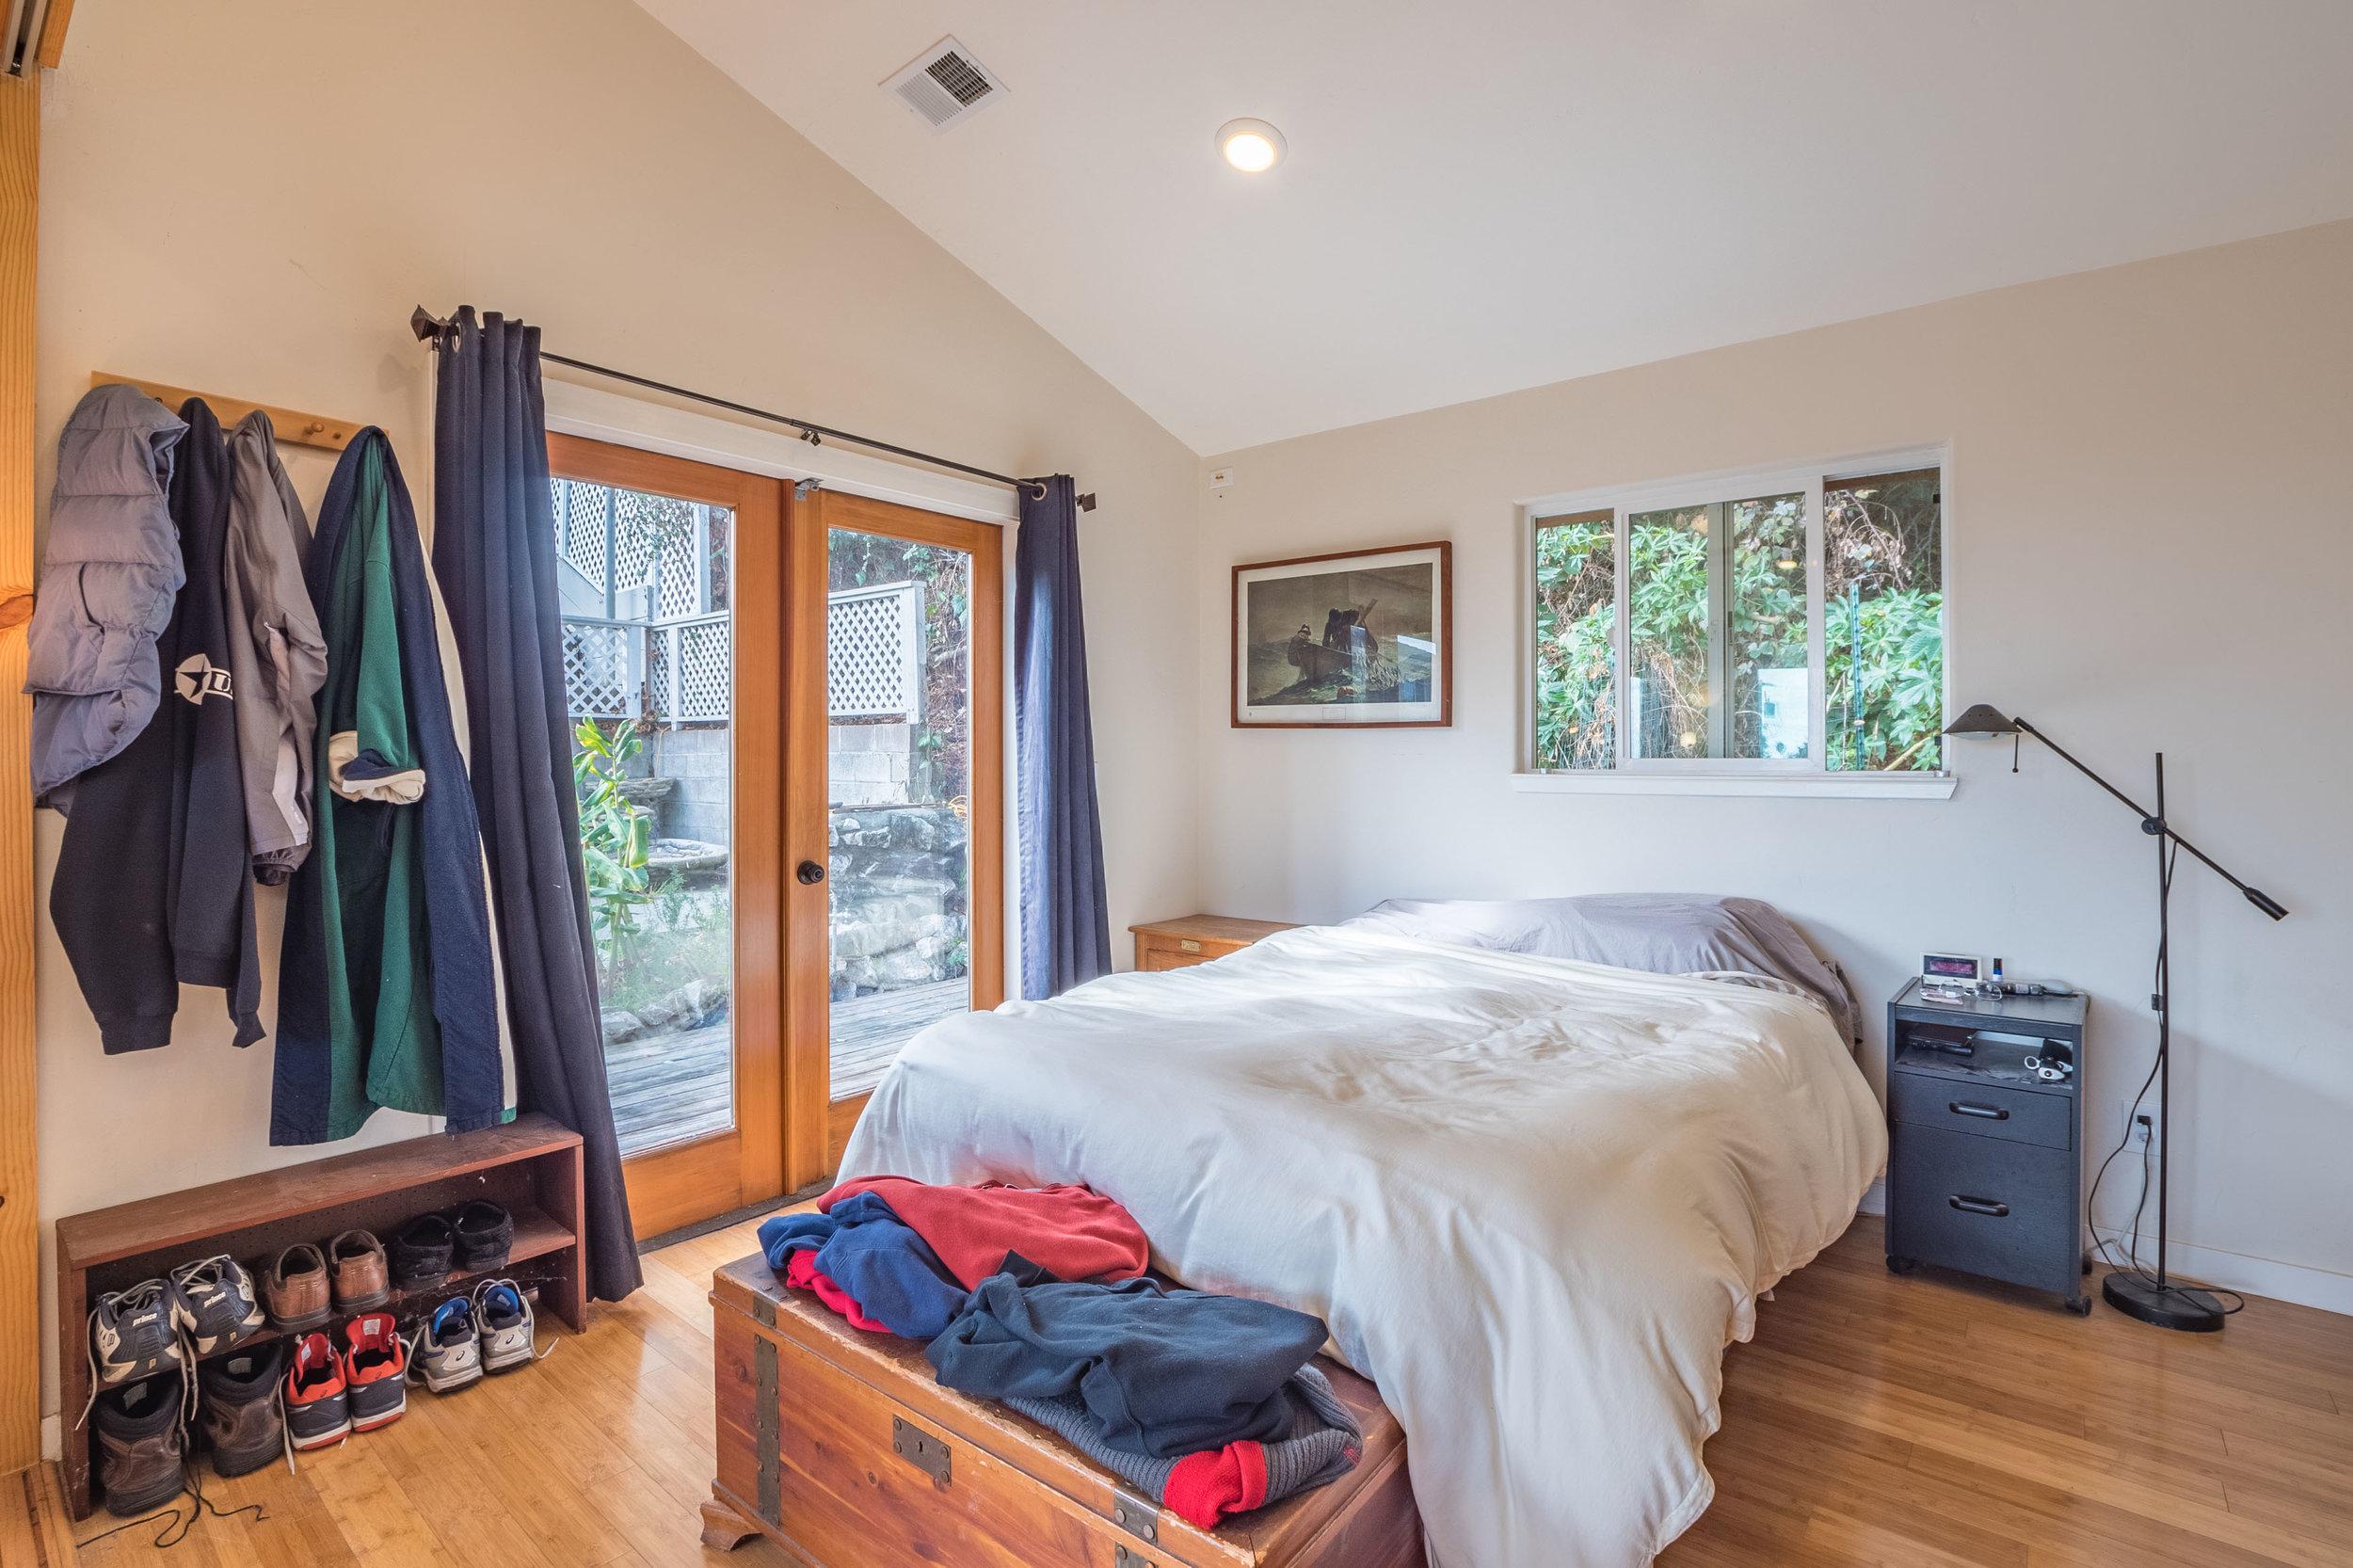 1 Bedroom ADU with Office in Santa Cruz, California